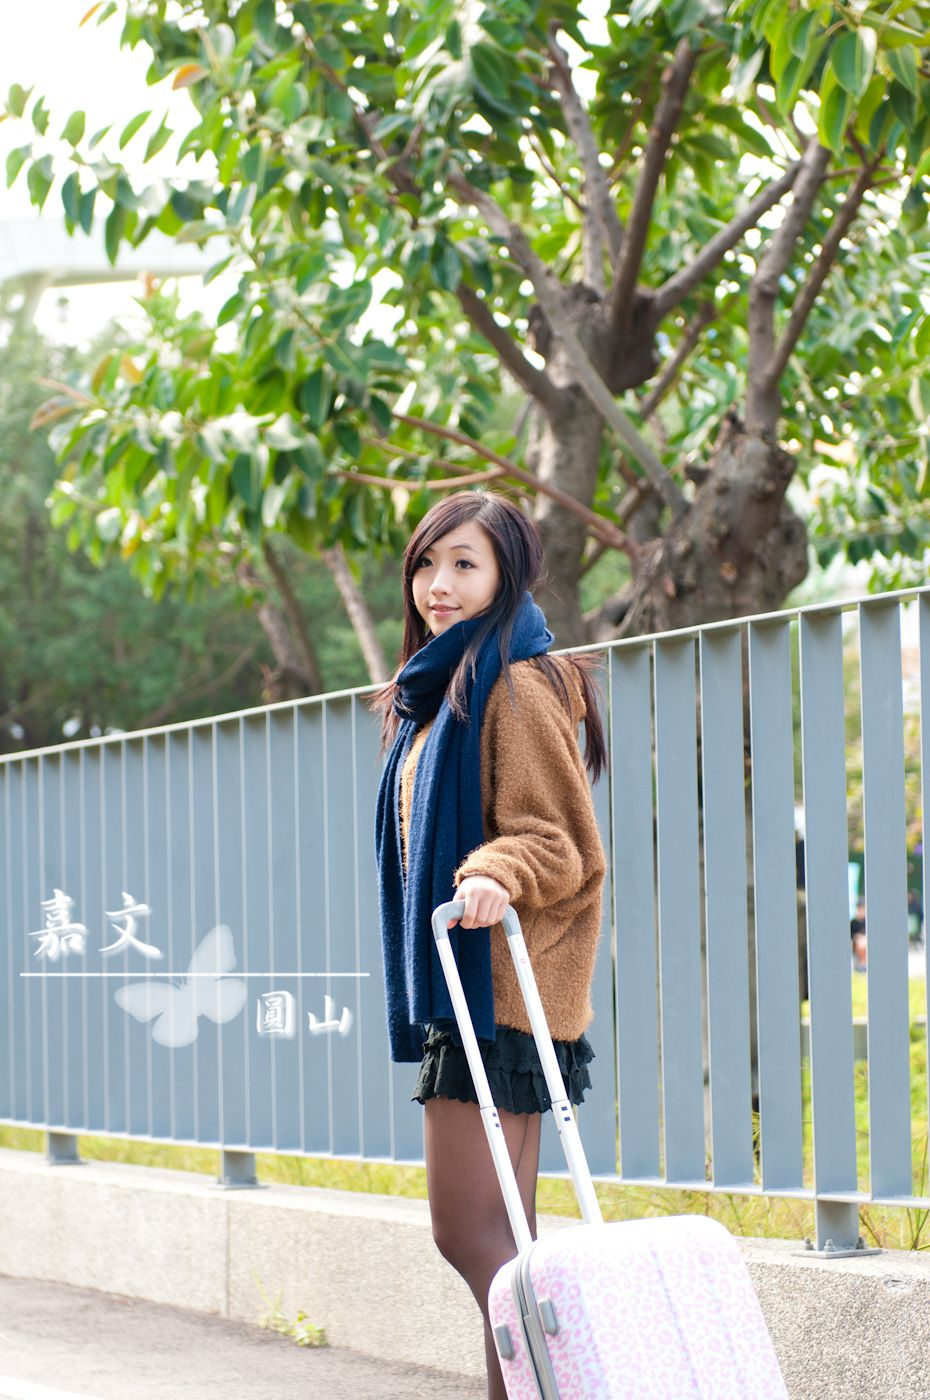 VOL.1104 [网络美女]清纯街拍正妹:郑嘉文(郑小奈)高品质写真套图(51P)